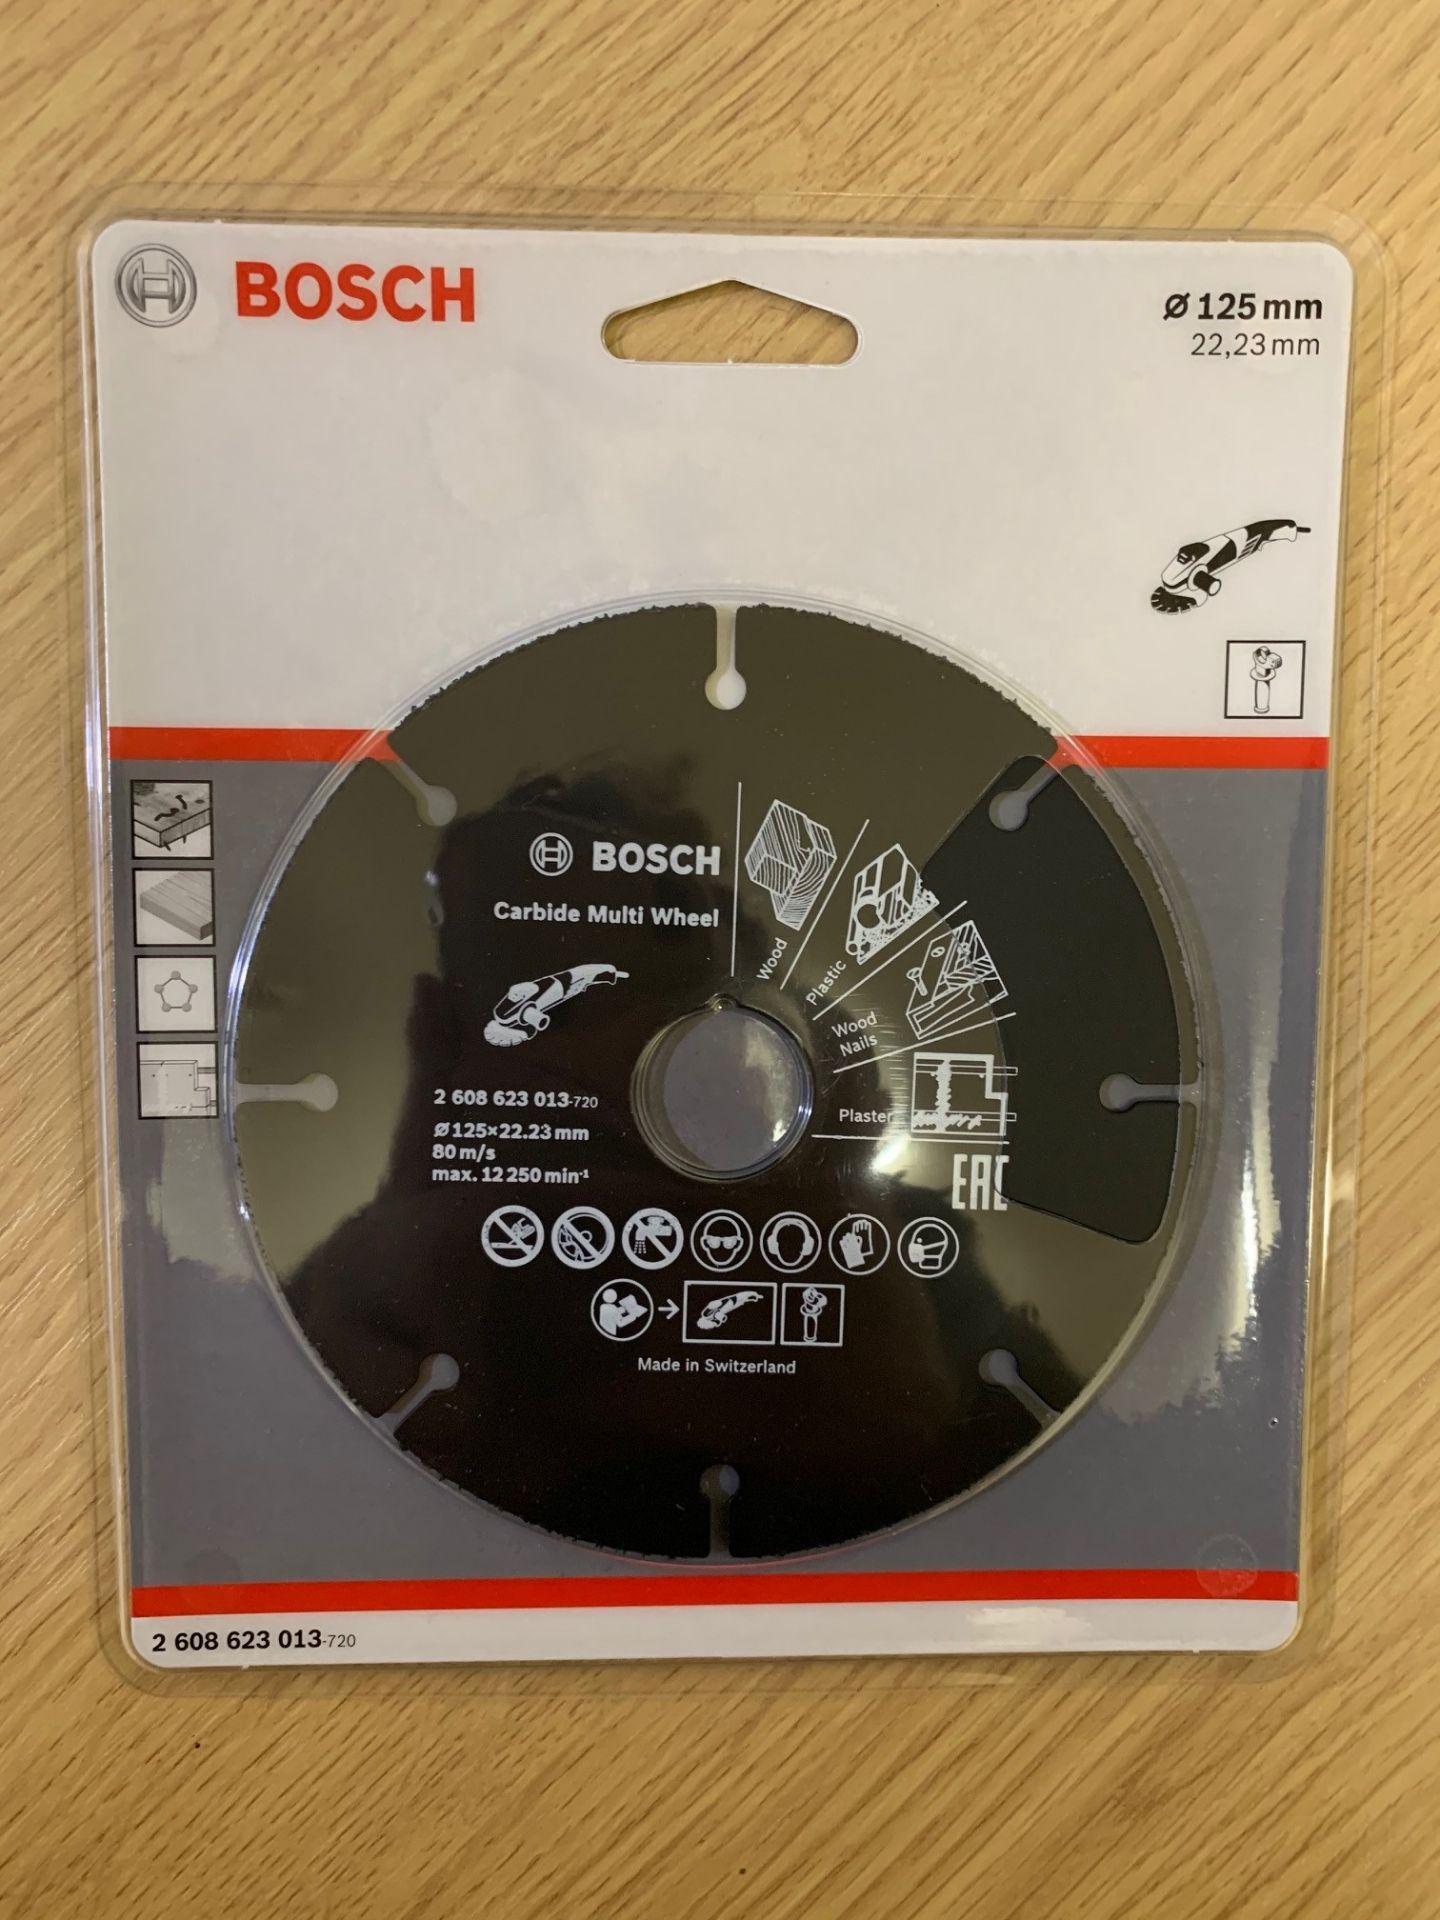 Lot 272 - 5 x Bosch 125mm Carbide Multi Wheels - Brand New